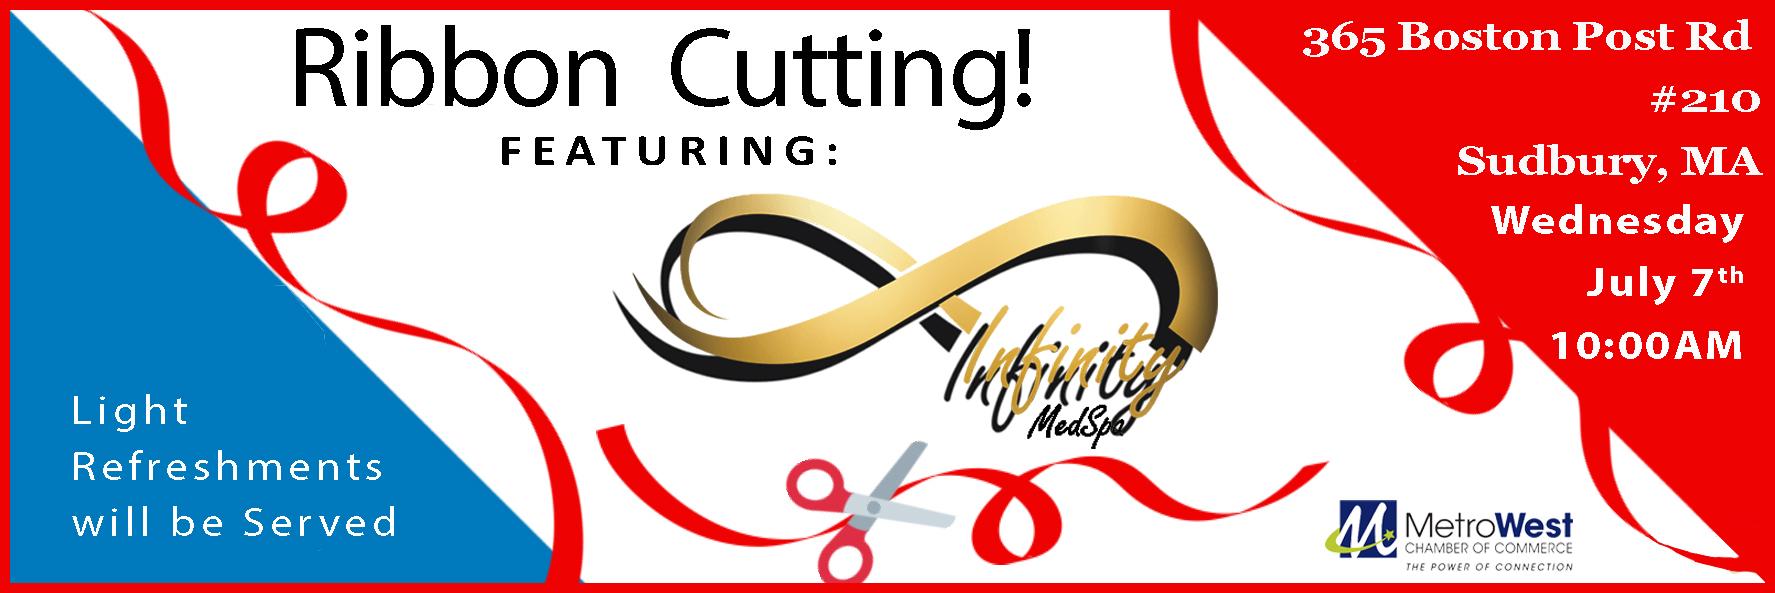 Infinity-MedSpa-7-7-21-Ribbon-Cutting-Web-Slider.jpg